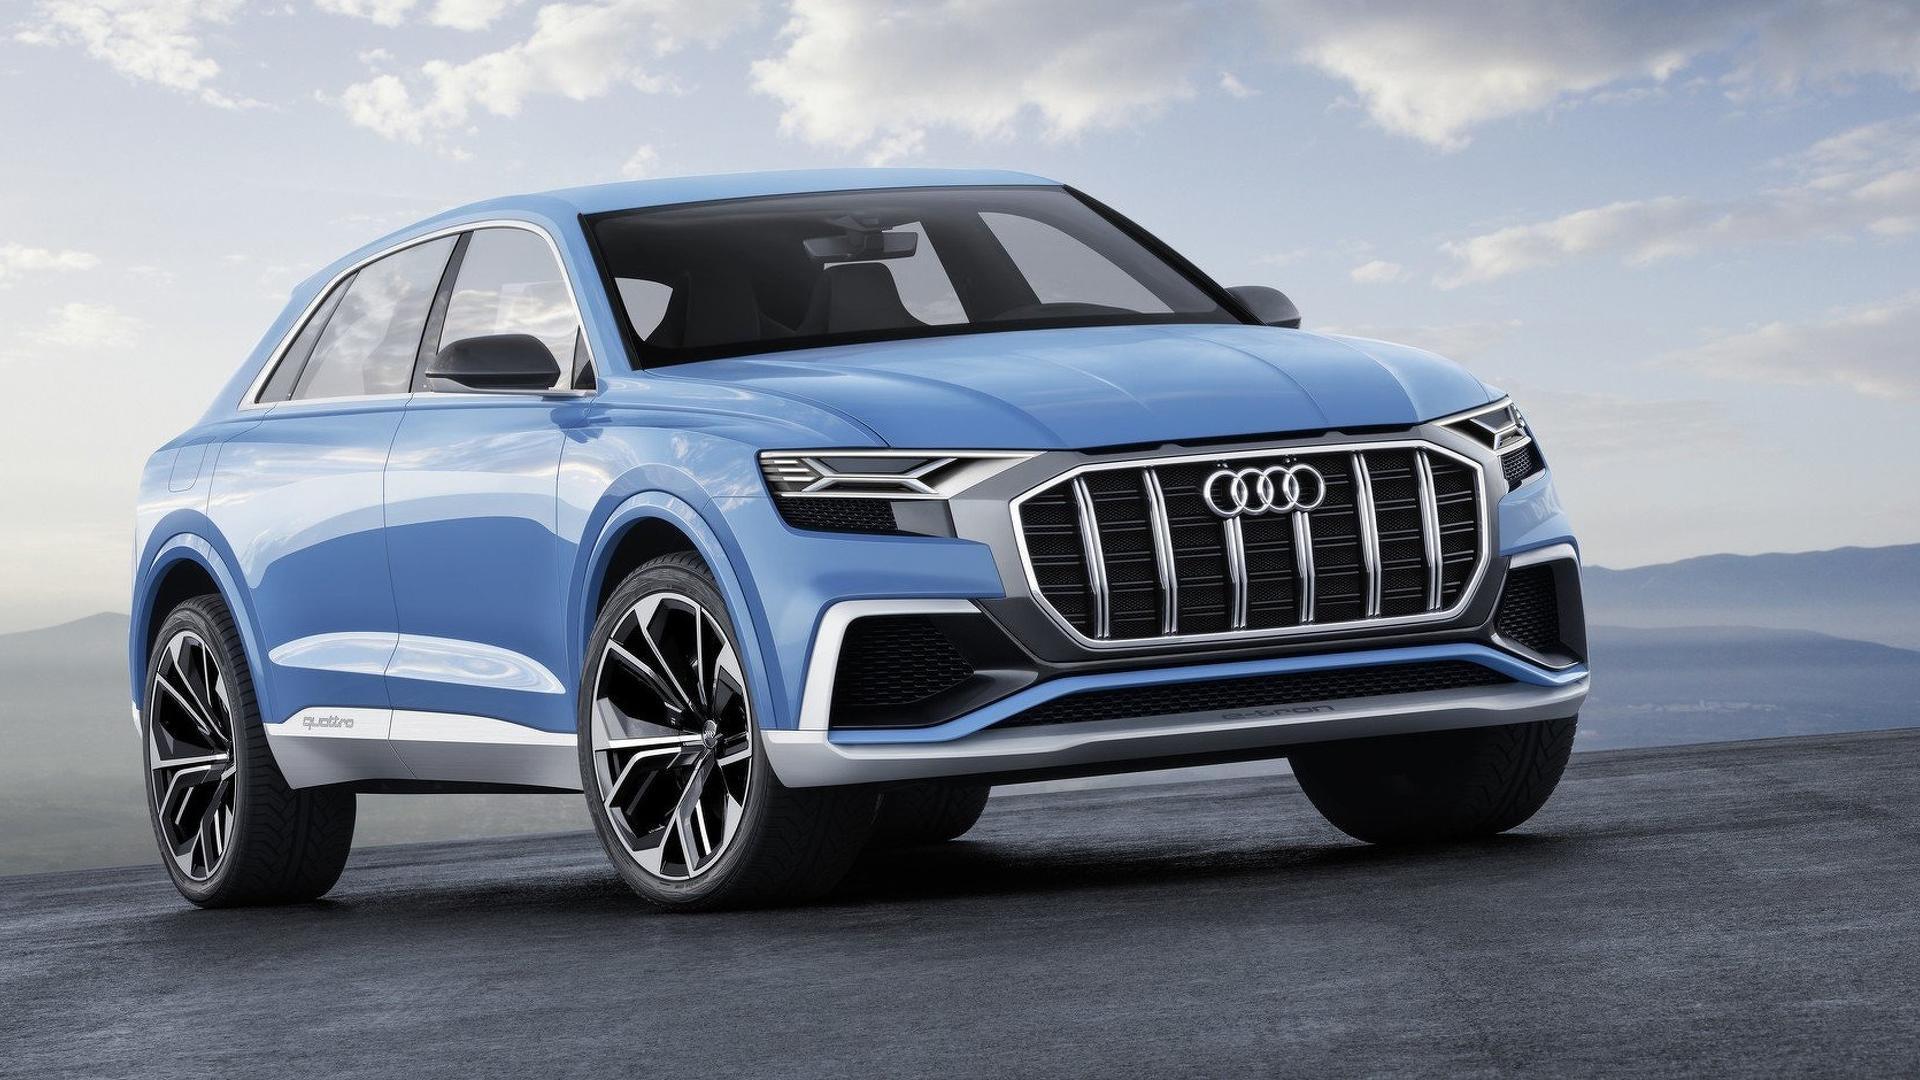 Kelebihan Audi Q10 Top Model Tahun Ini